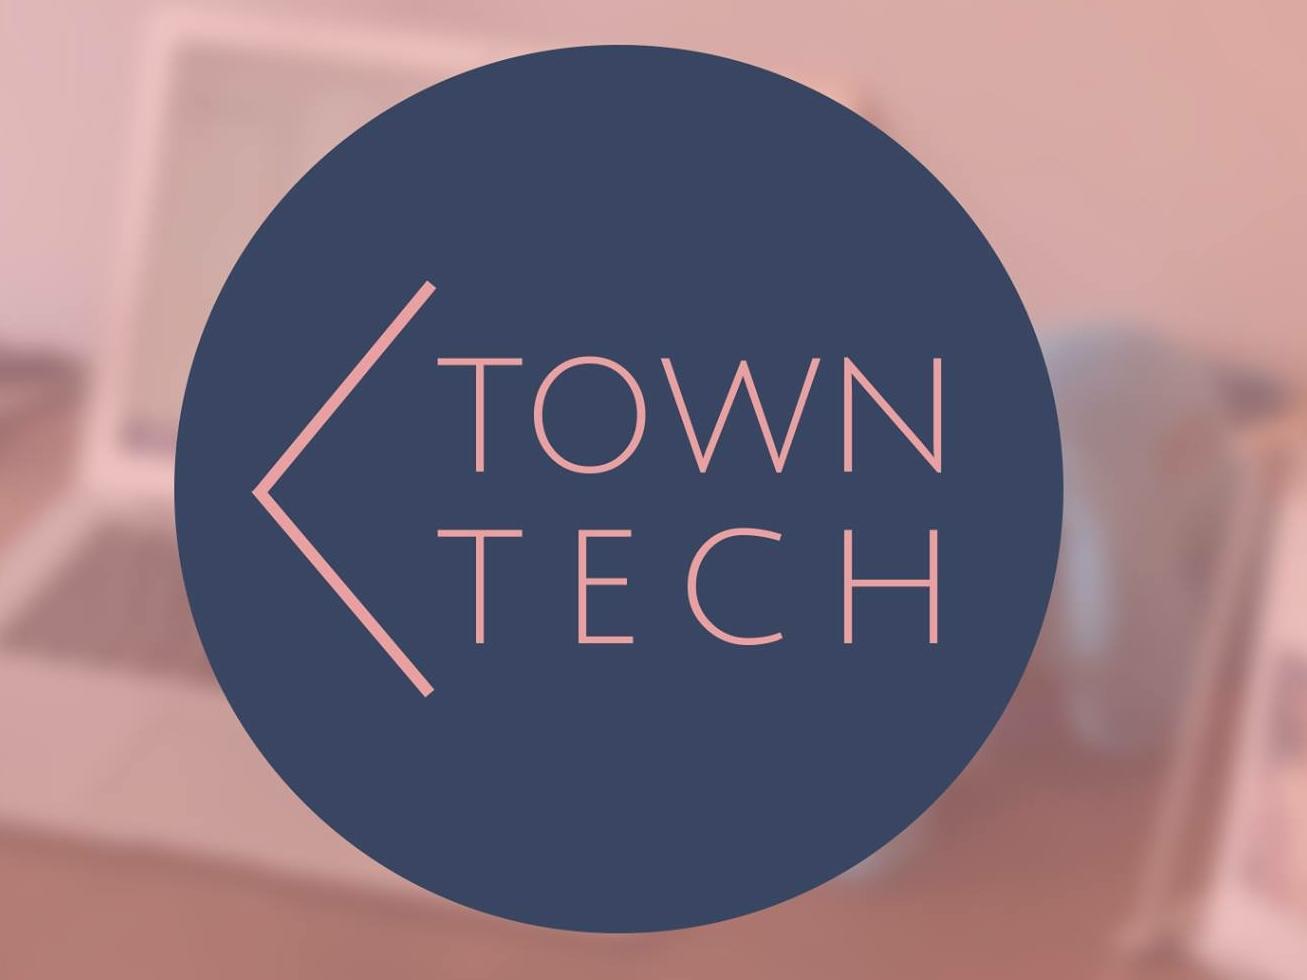 TownTech branding logo design